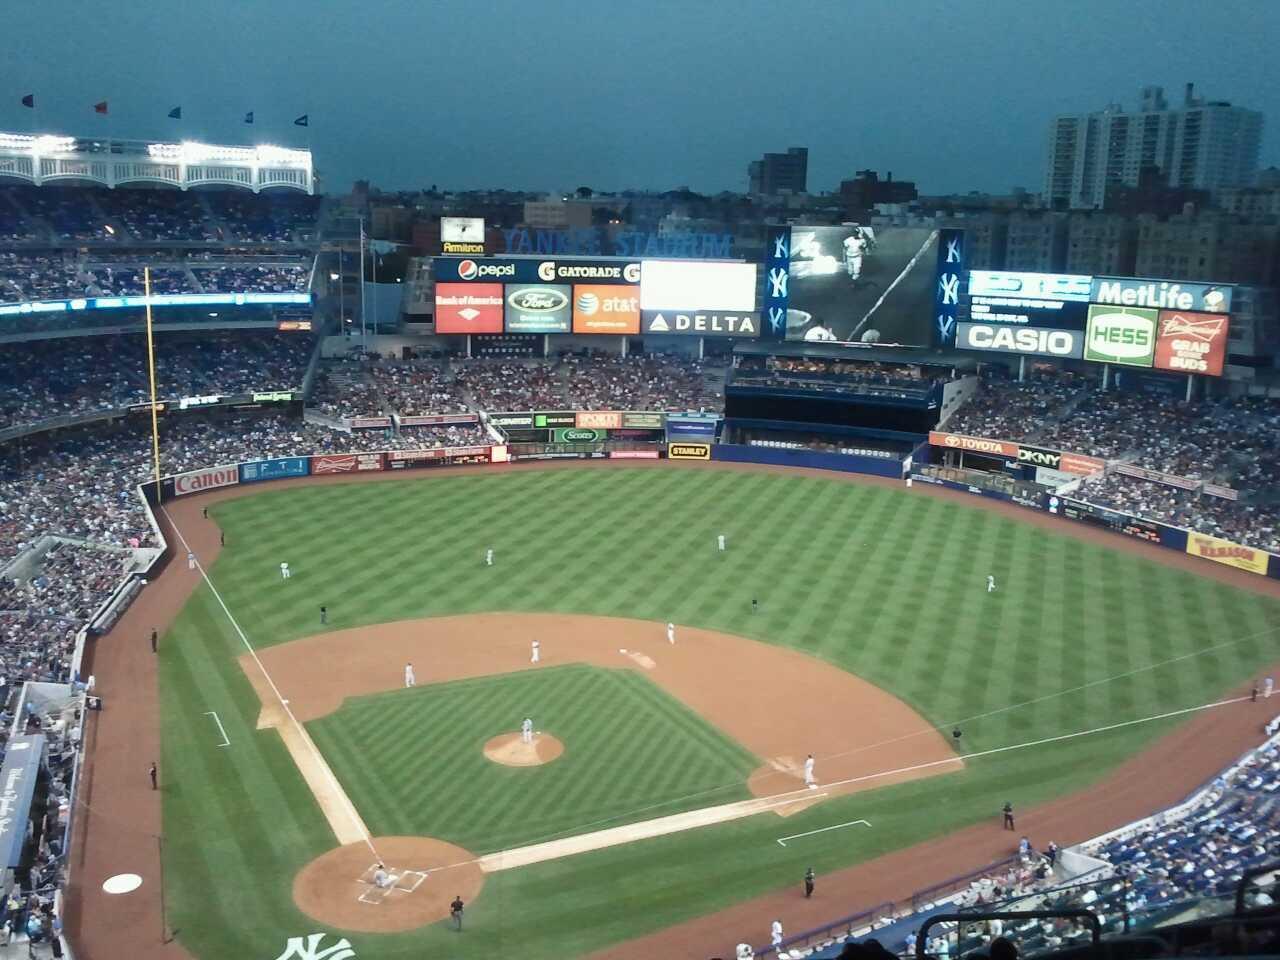 Yankee Stadium Secção 419 Fila 10 Lugar 10